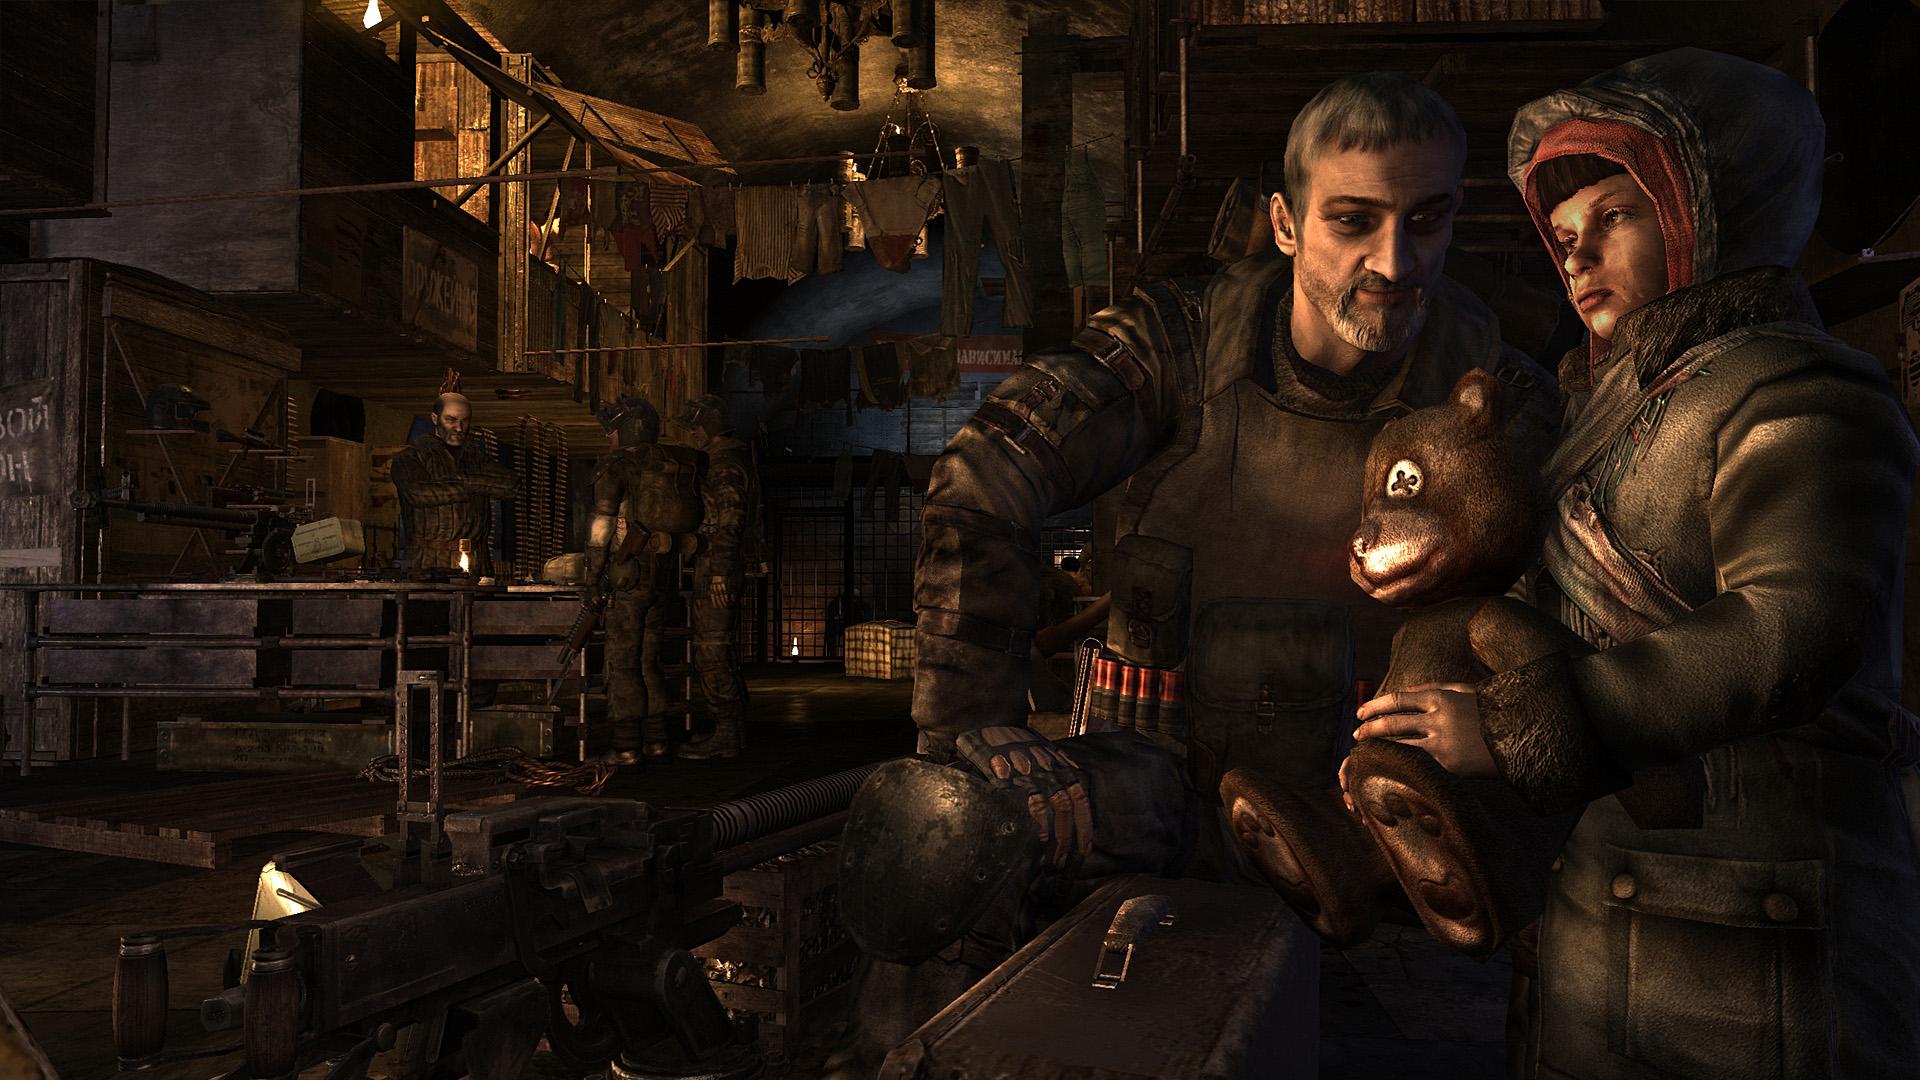 Metro 2033 Pictures